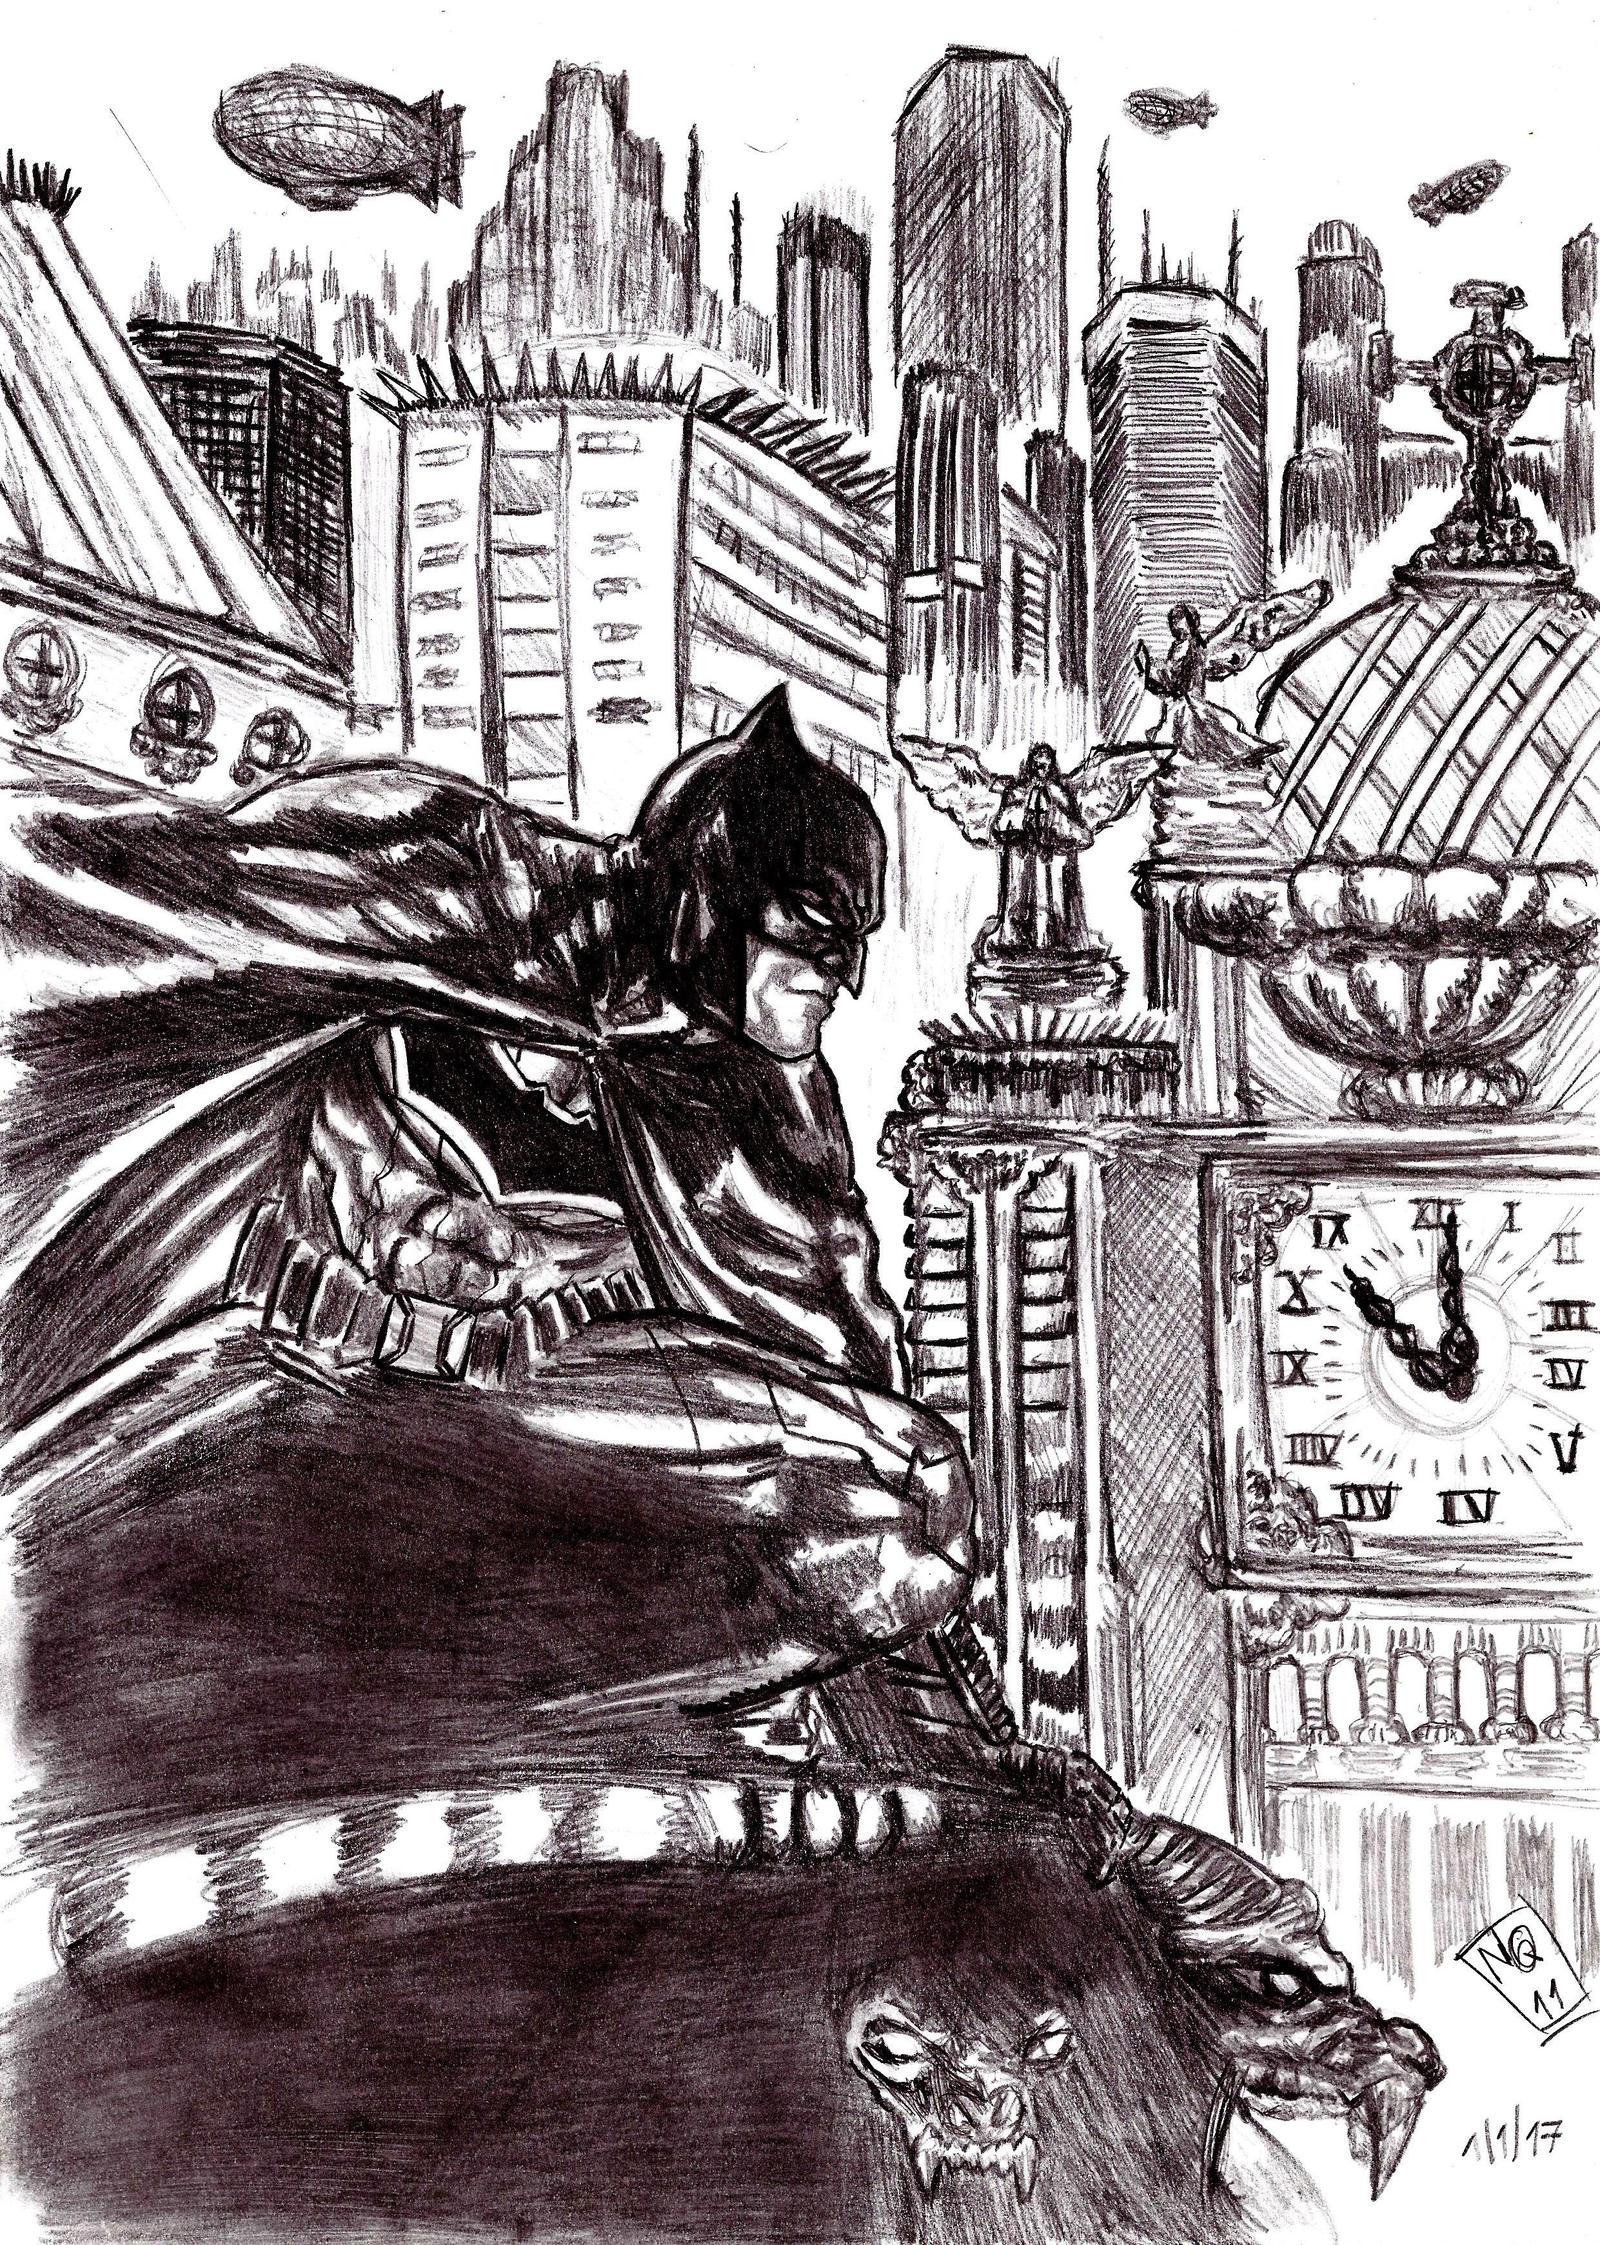 Bat Pencils1 by nic011